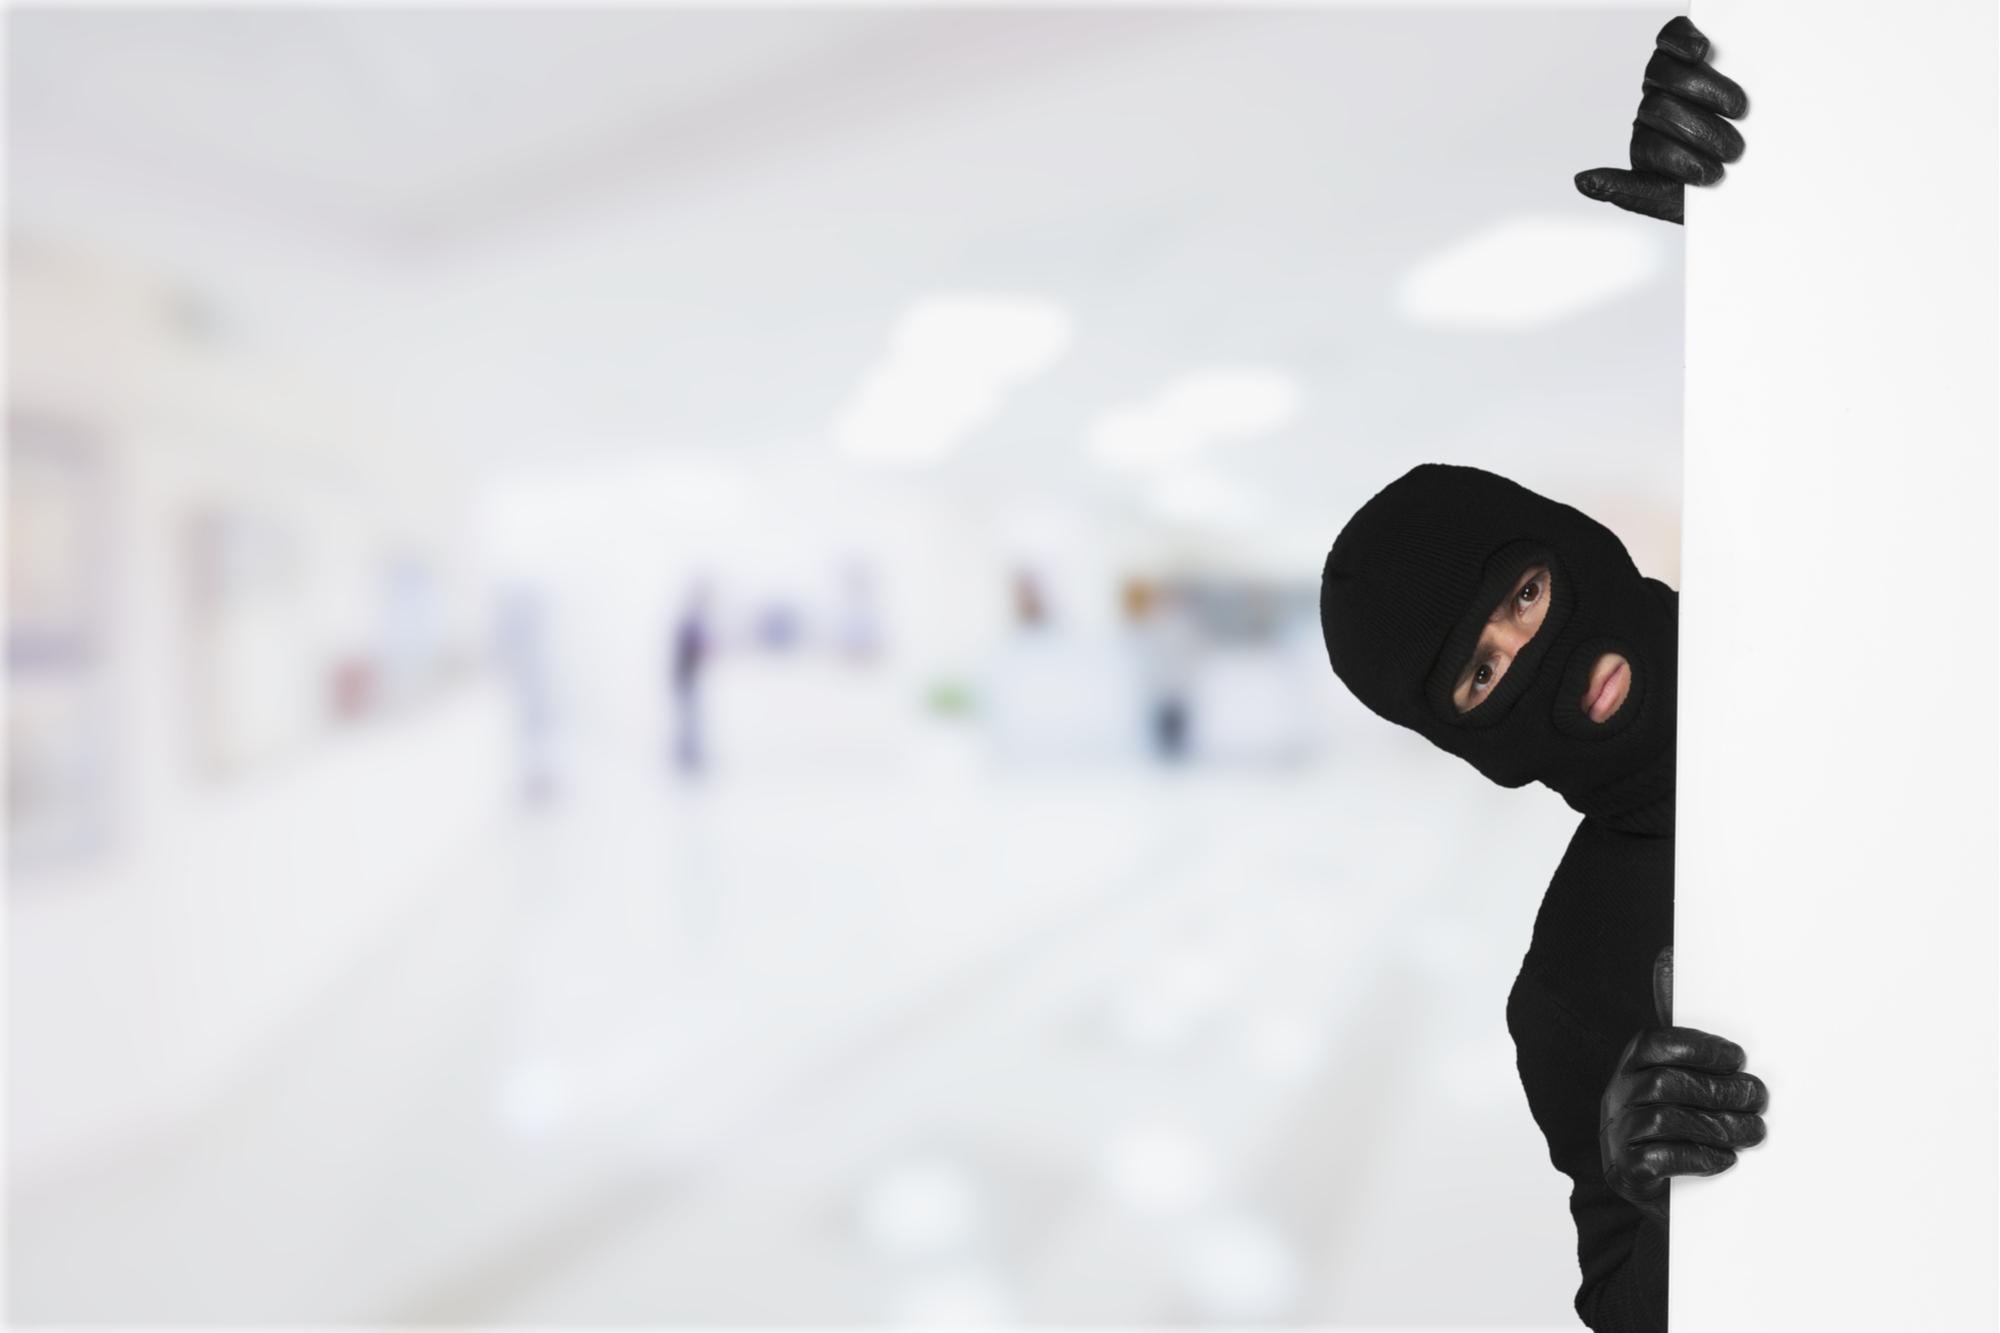 An Alleged Hacker Stole $30